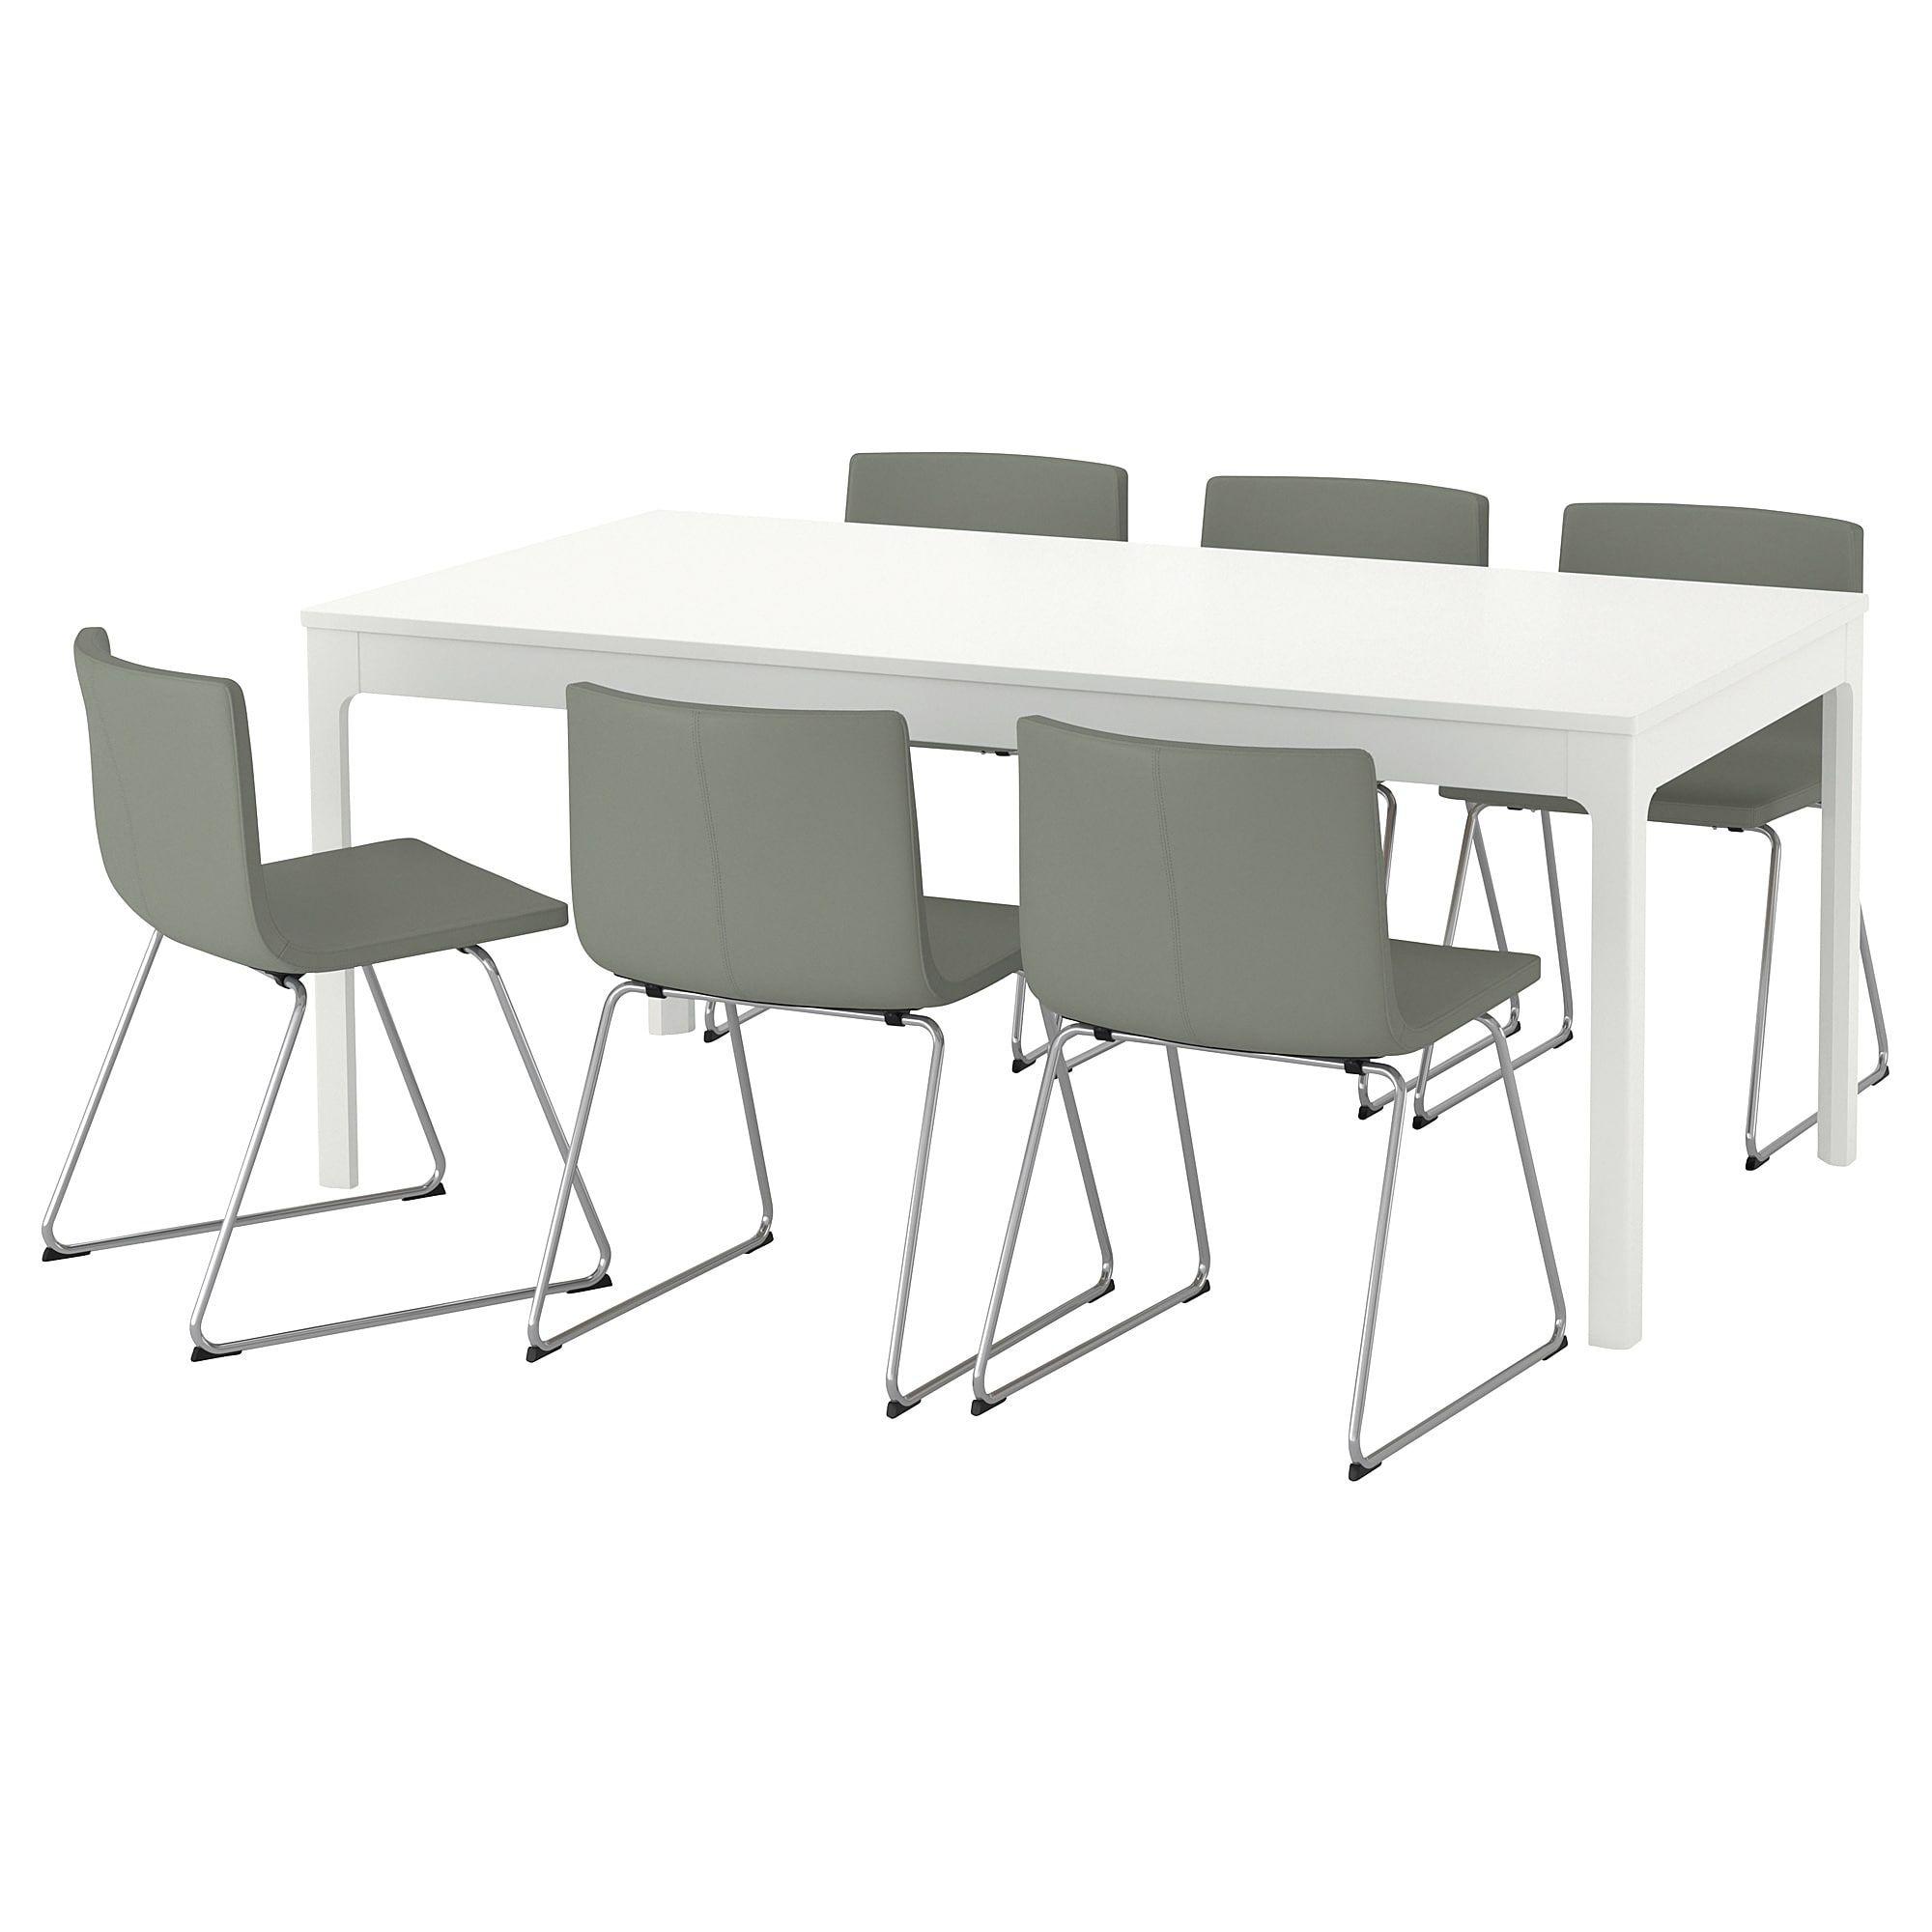 Australia Ikea dining sets, Ikea dining, Furniture